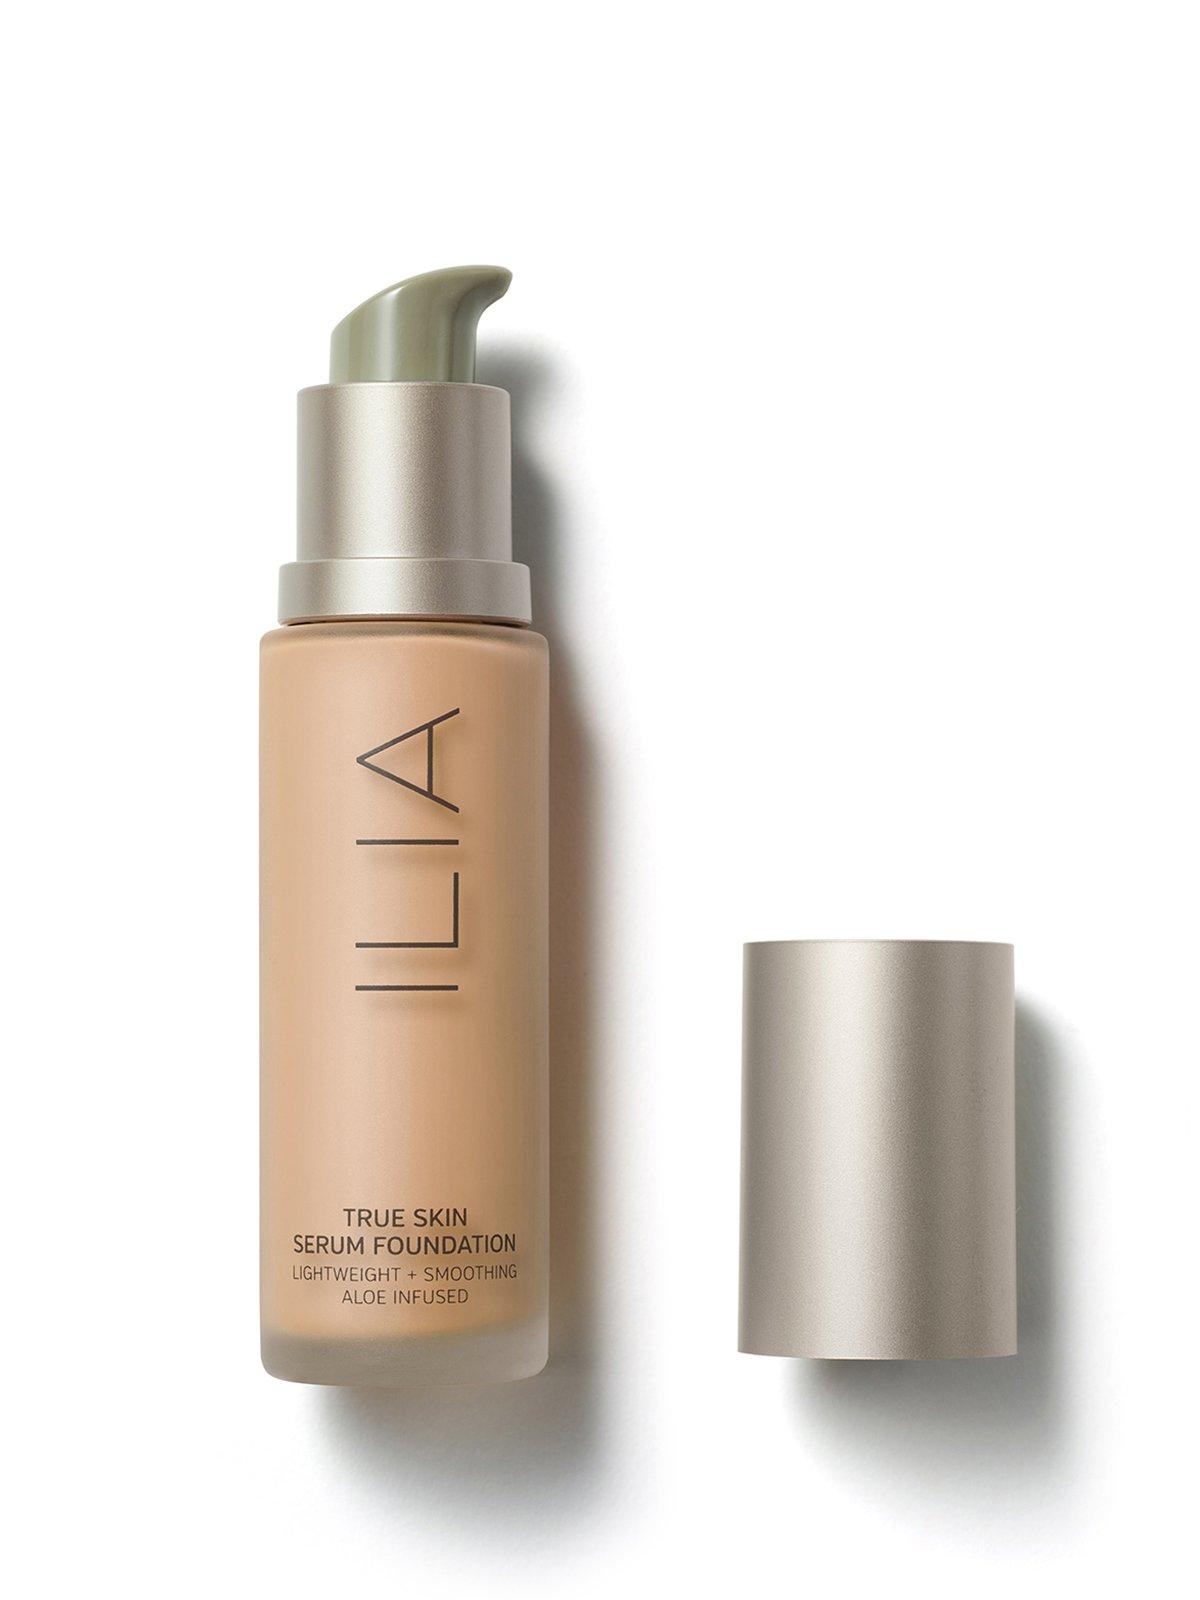 Ilia true skin.jpg